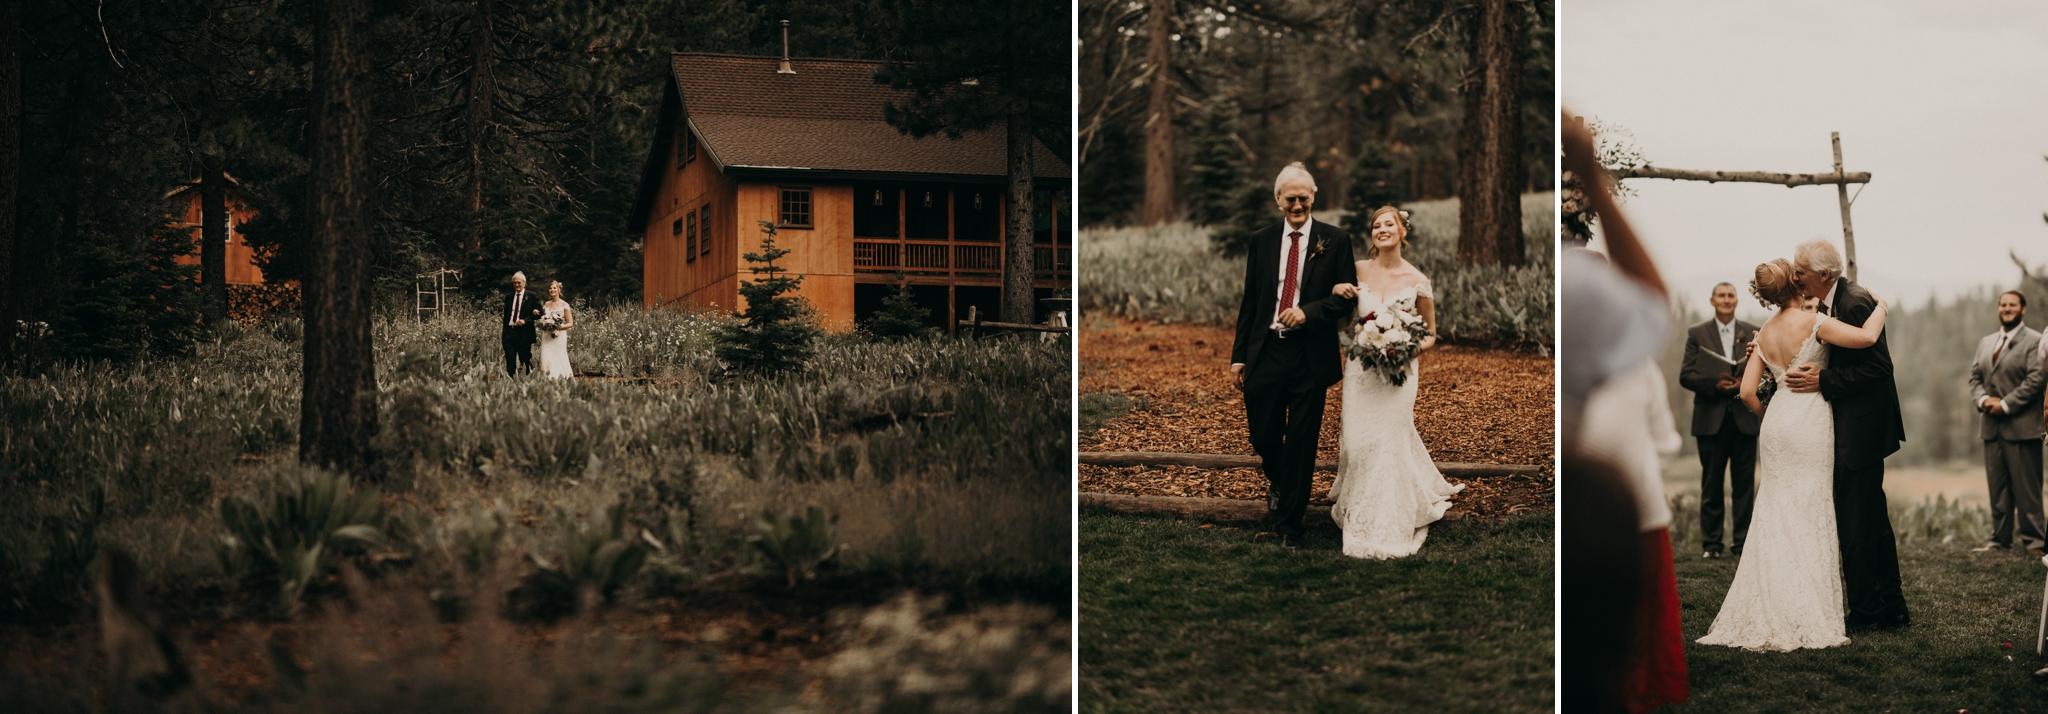 redwood-wedding15-1.jpg